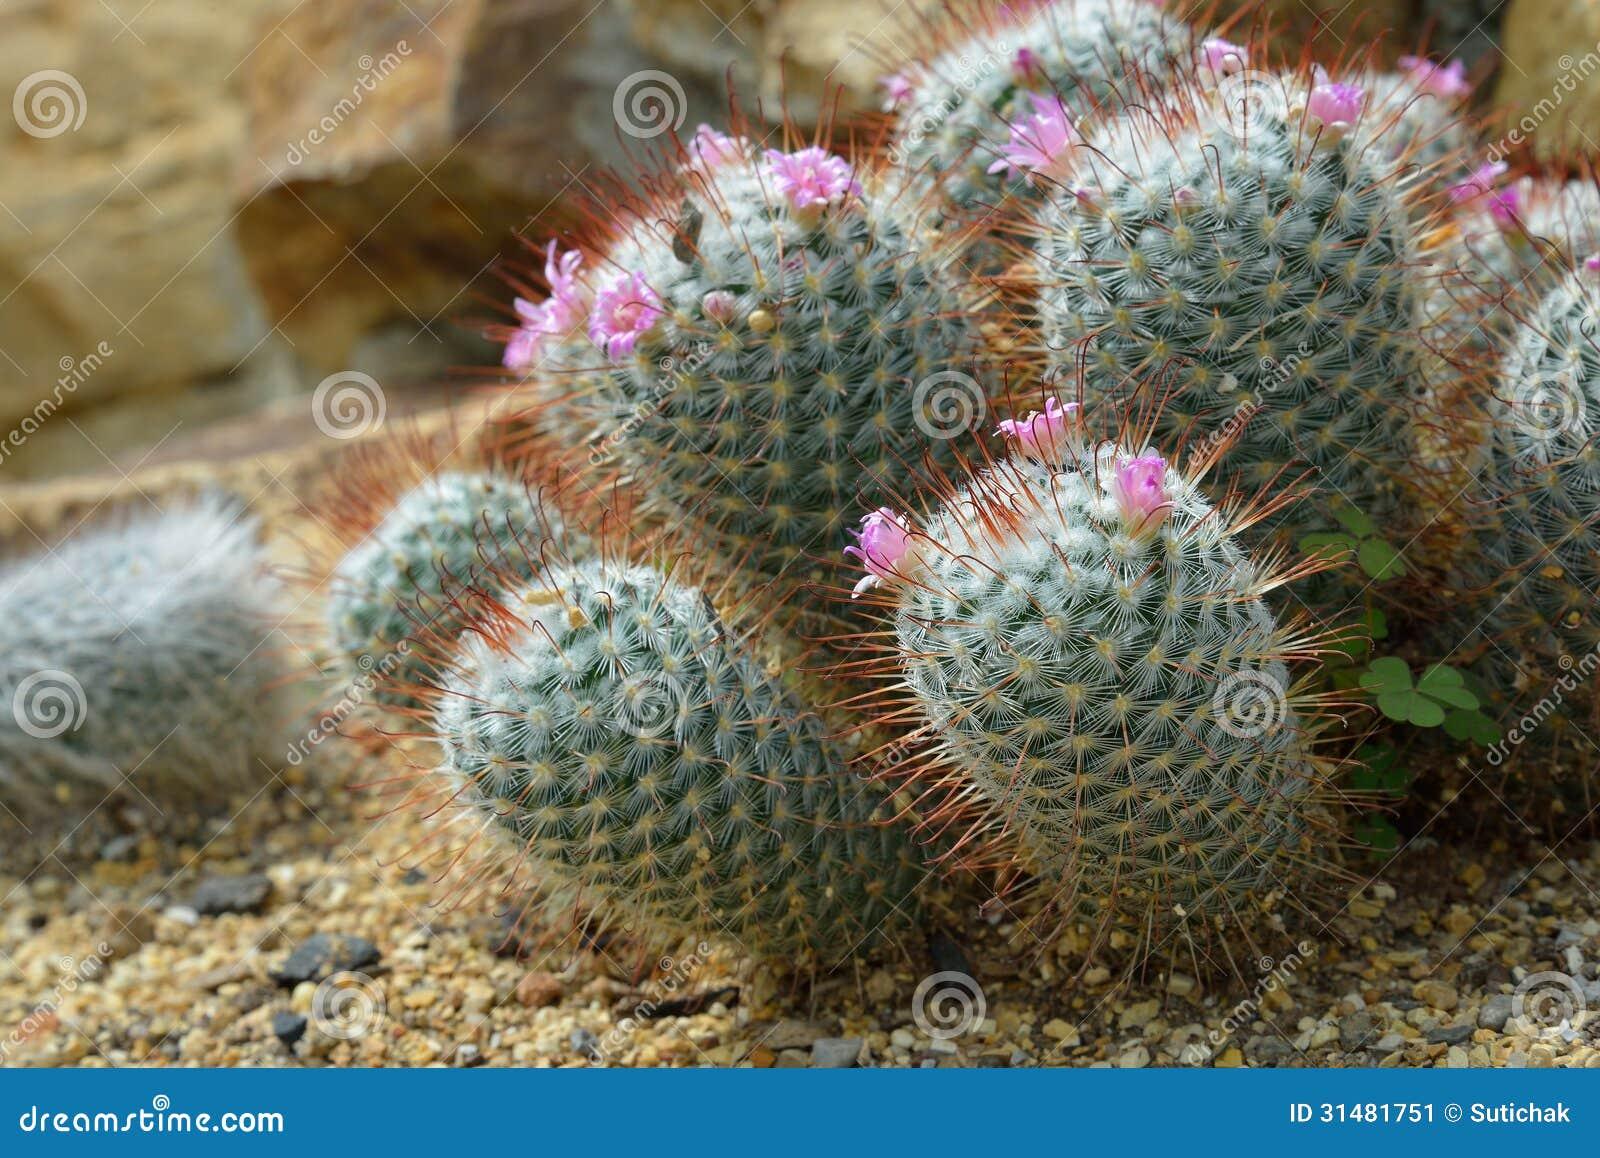 Mammillaria Elegans Cactus Grows In Sand Stock Image  : mammillaria elegans cactus grows sand 31481751 from www.dreamstime.com size 1300 x 958 jpeg 242kB